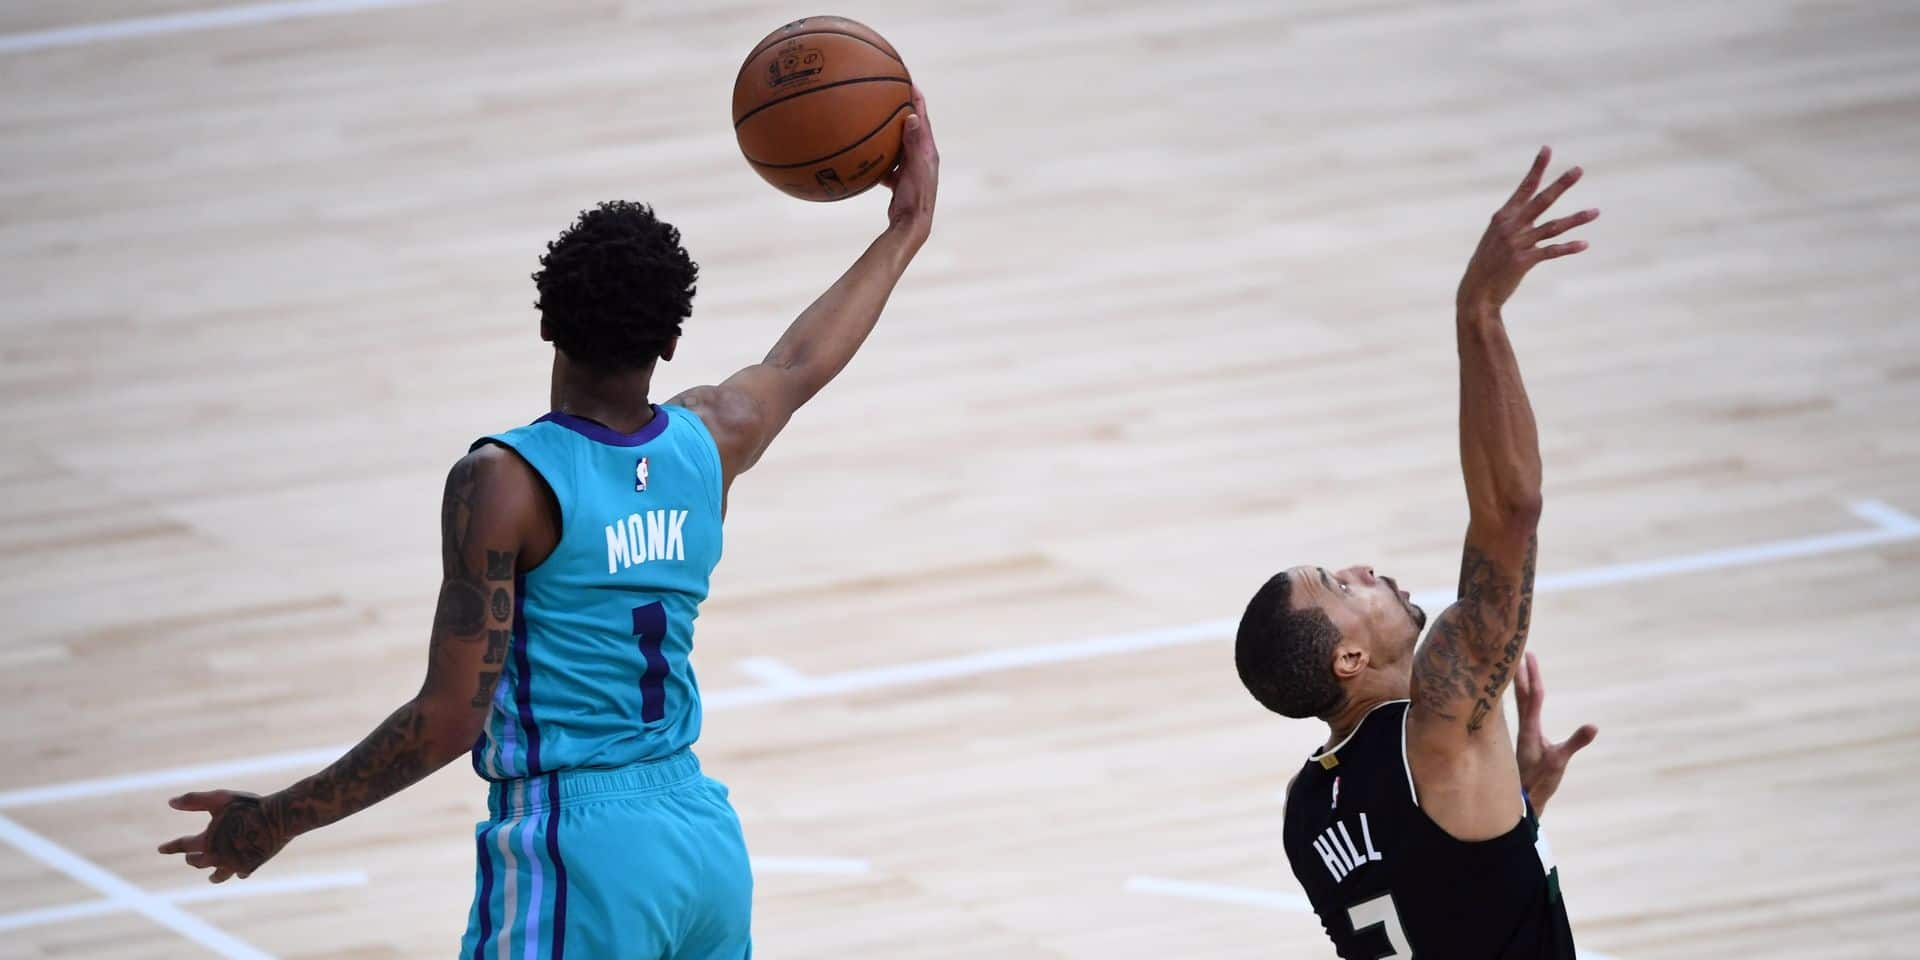 La loterie de la draft NBA reportée